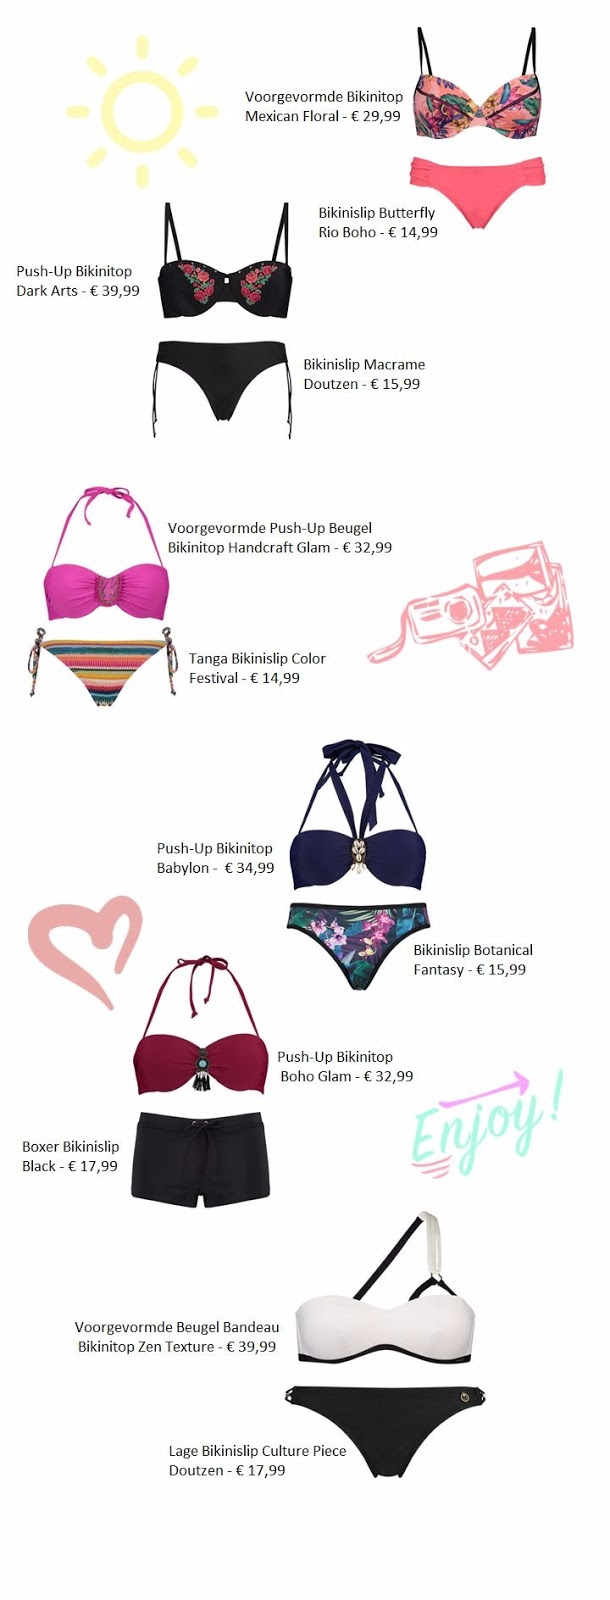 60633 bikini2b22btest - INSPIRATIE | 10 X LEUKE MIX & MATCH BIKINI'S VAN DE HUNKEMÖLLER